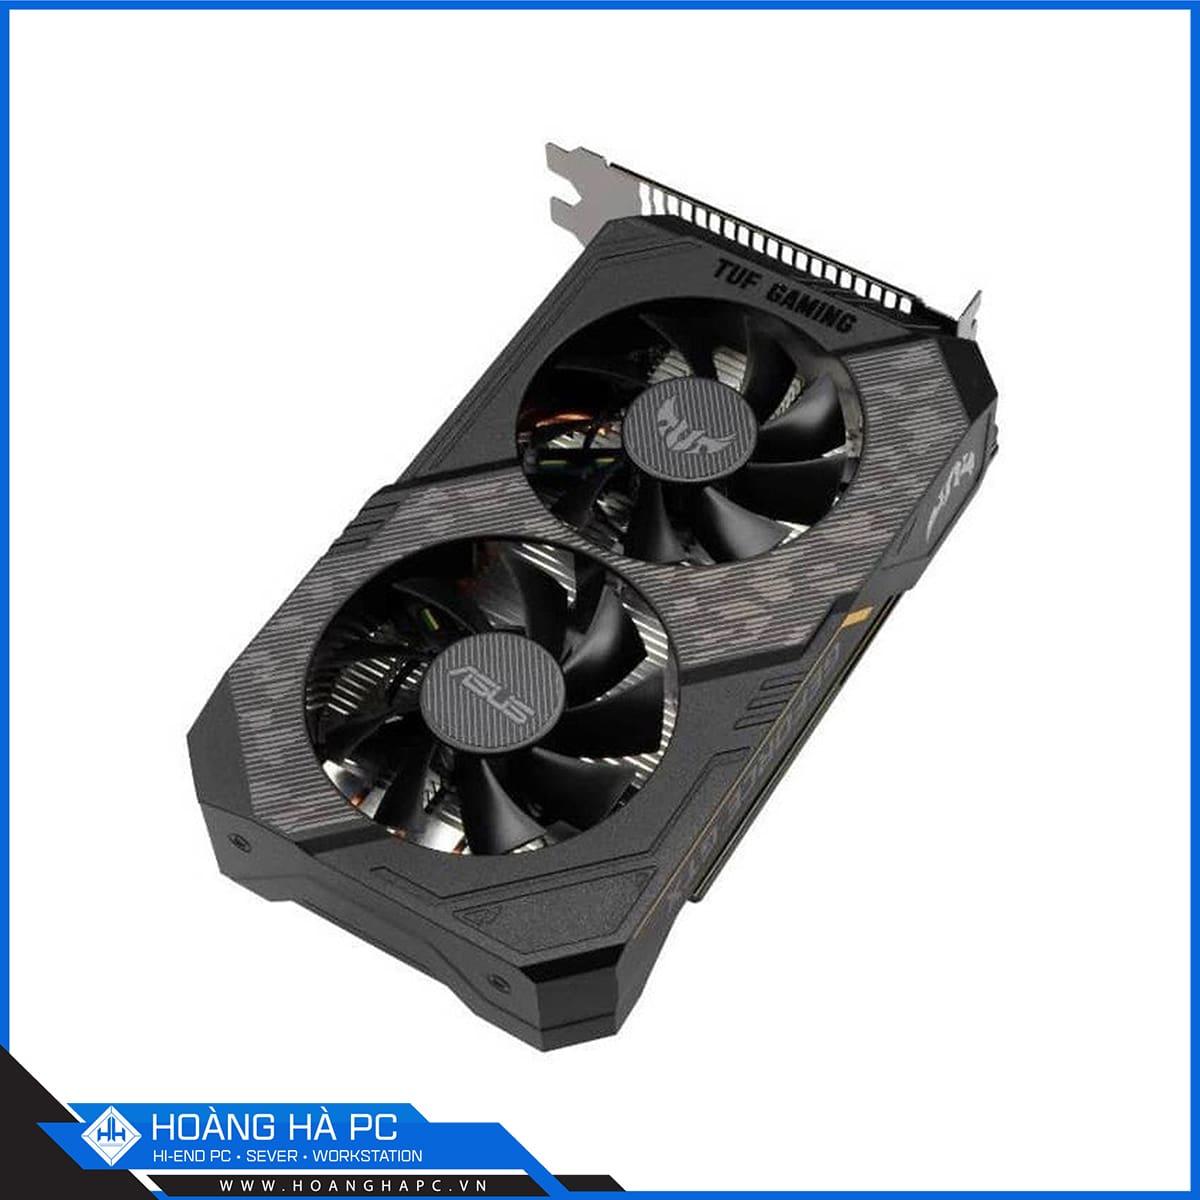 Asus TUF GTX 1650 Super 4G Gaming